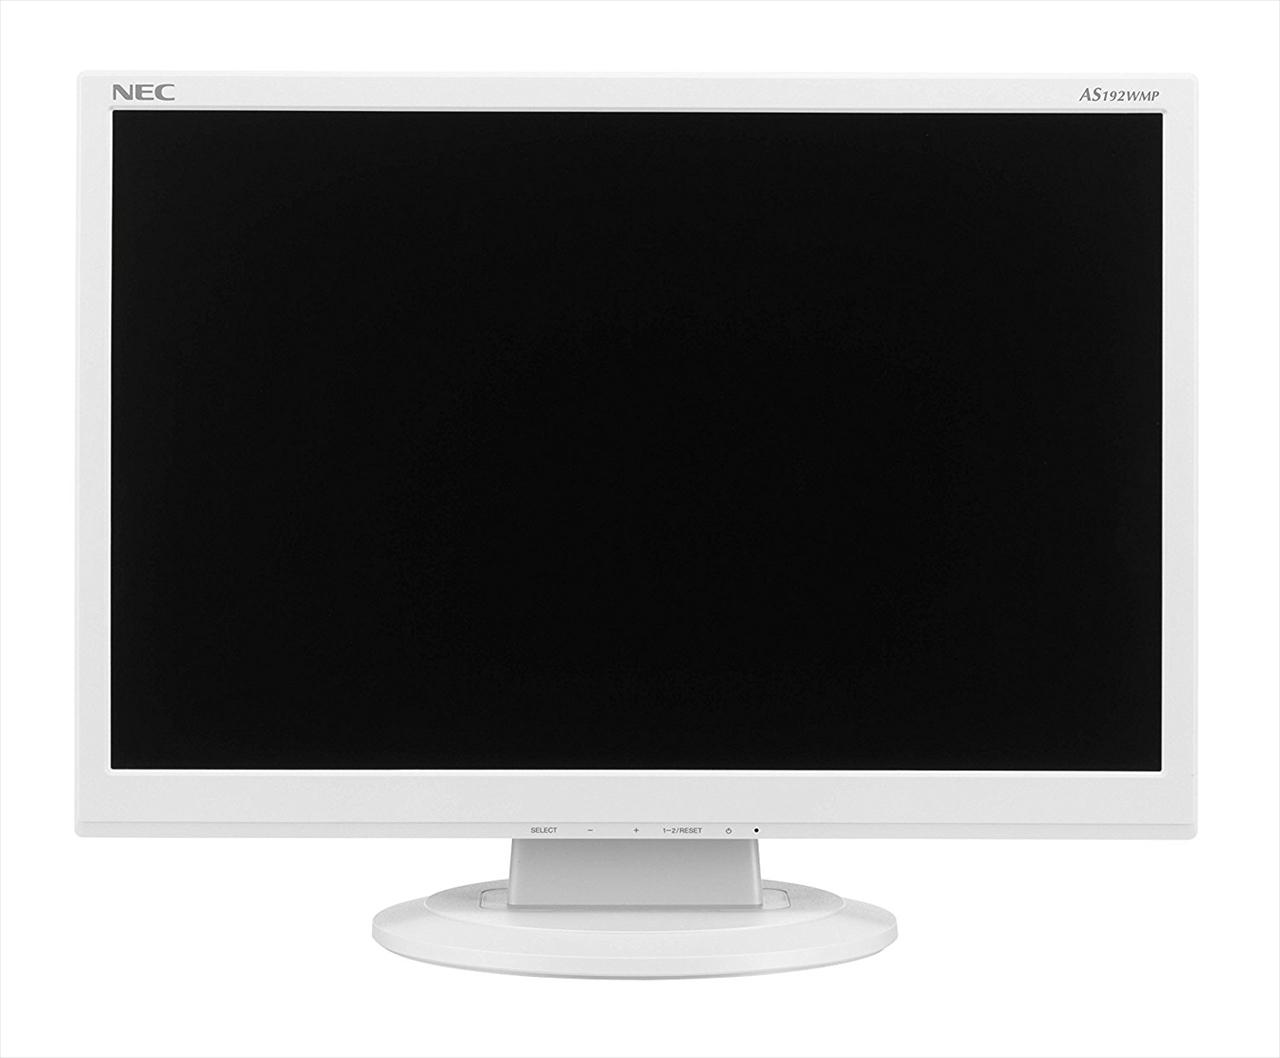 LCD-AS192WMP [19インチ]